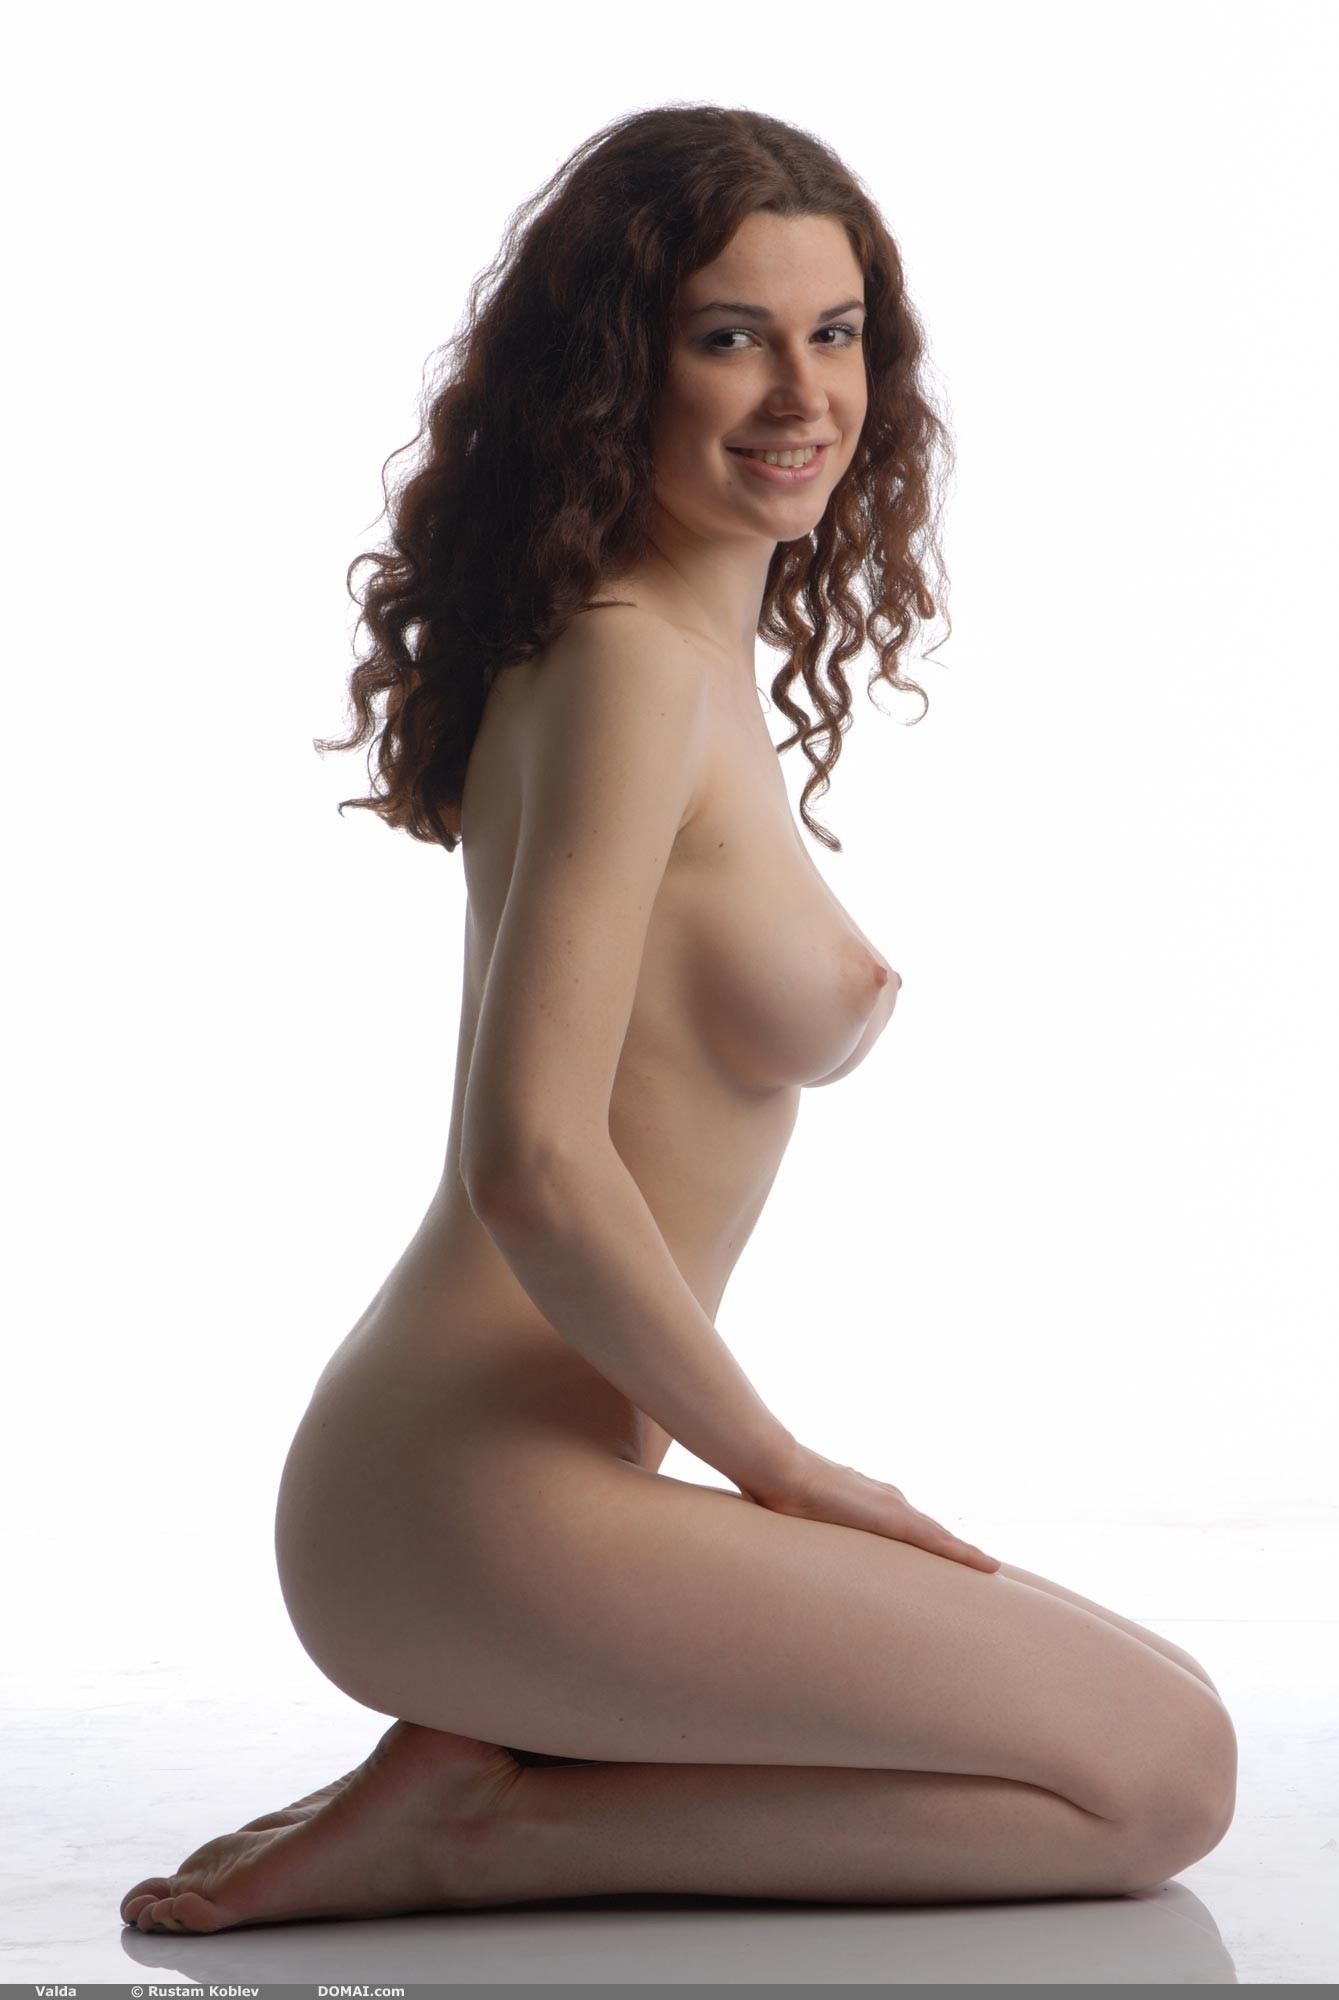 Юлия зимина без трусов 12 фотография